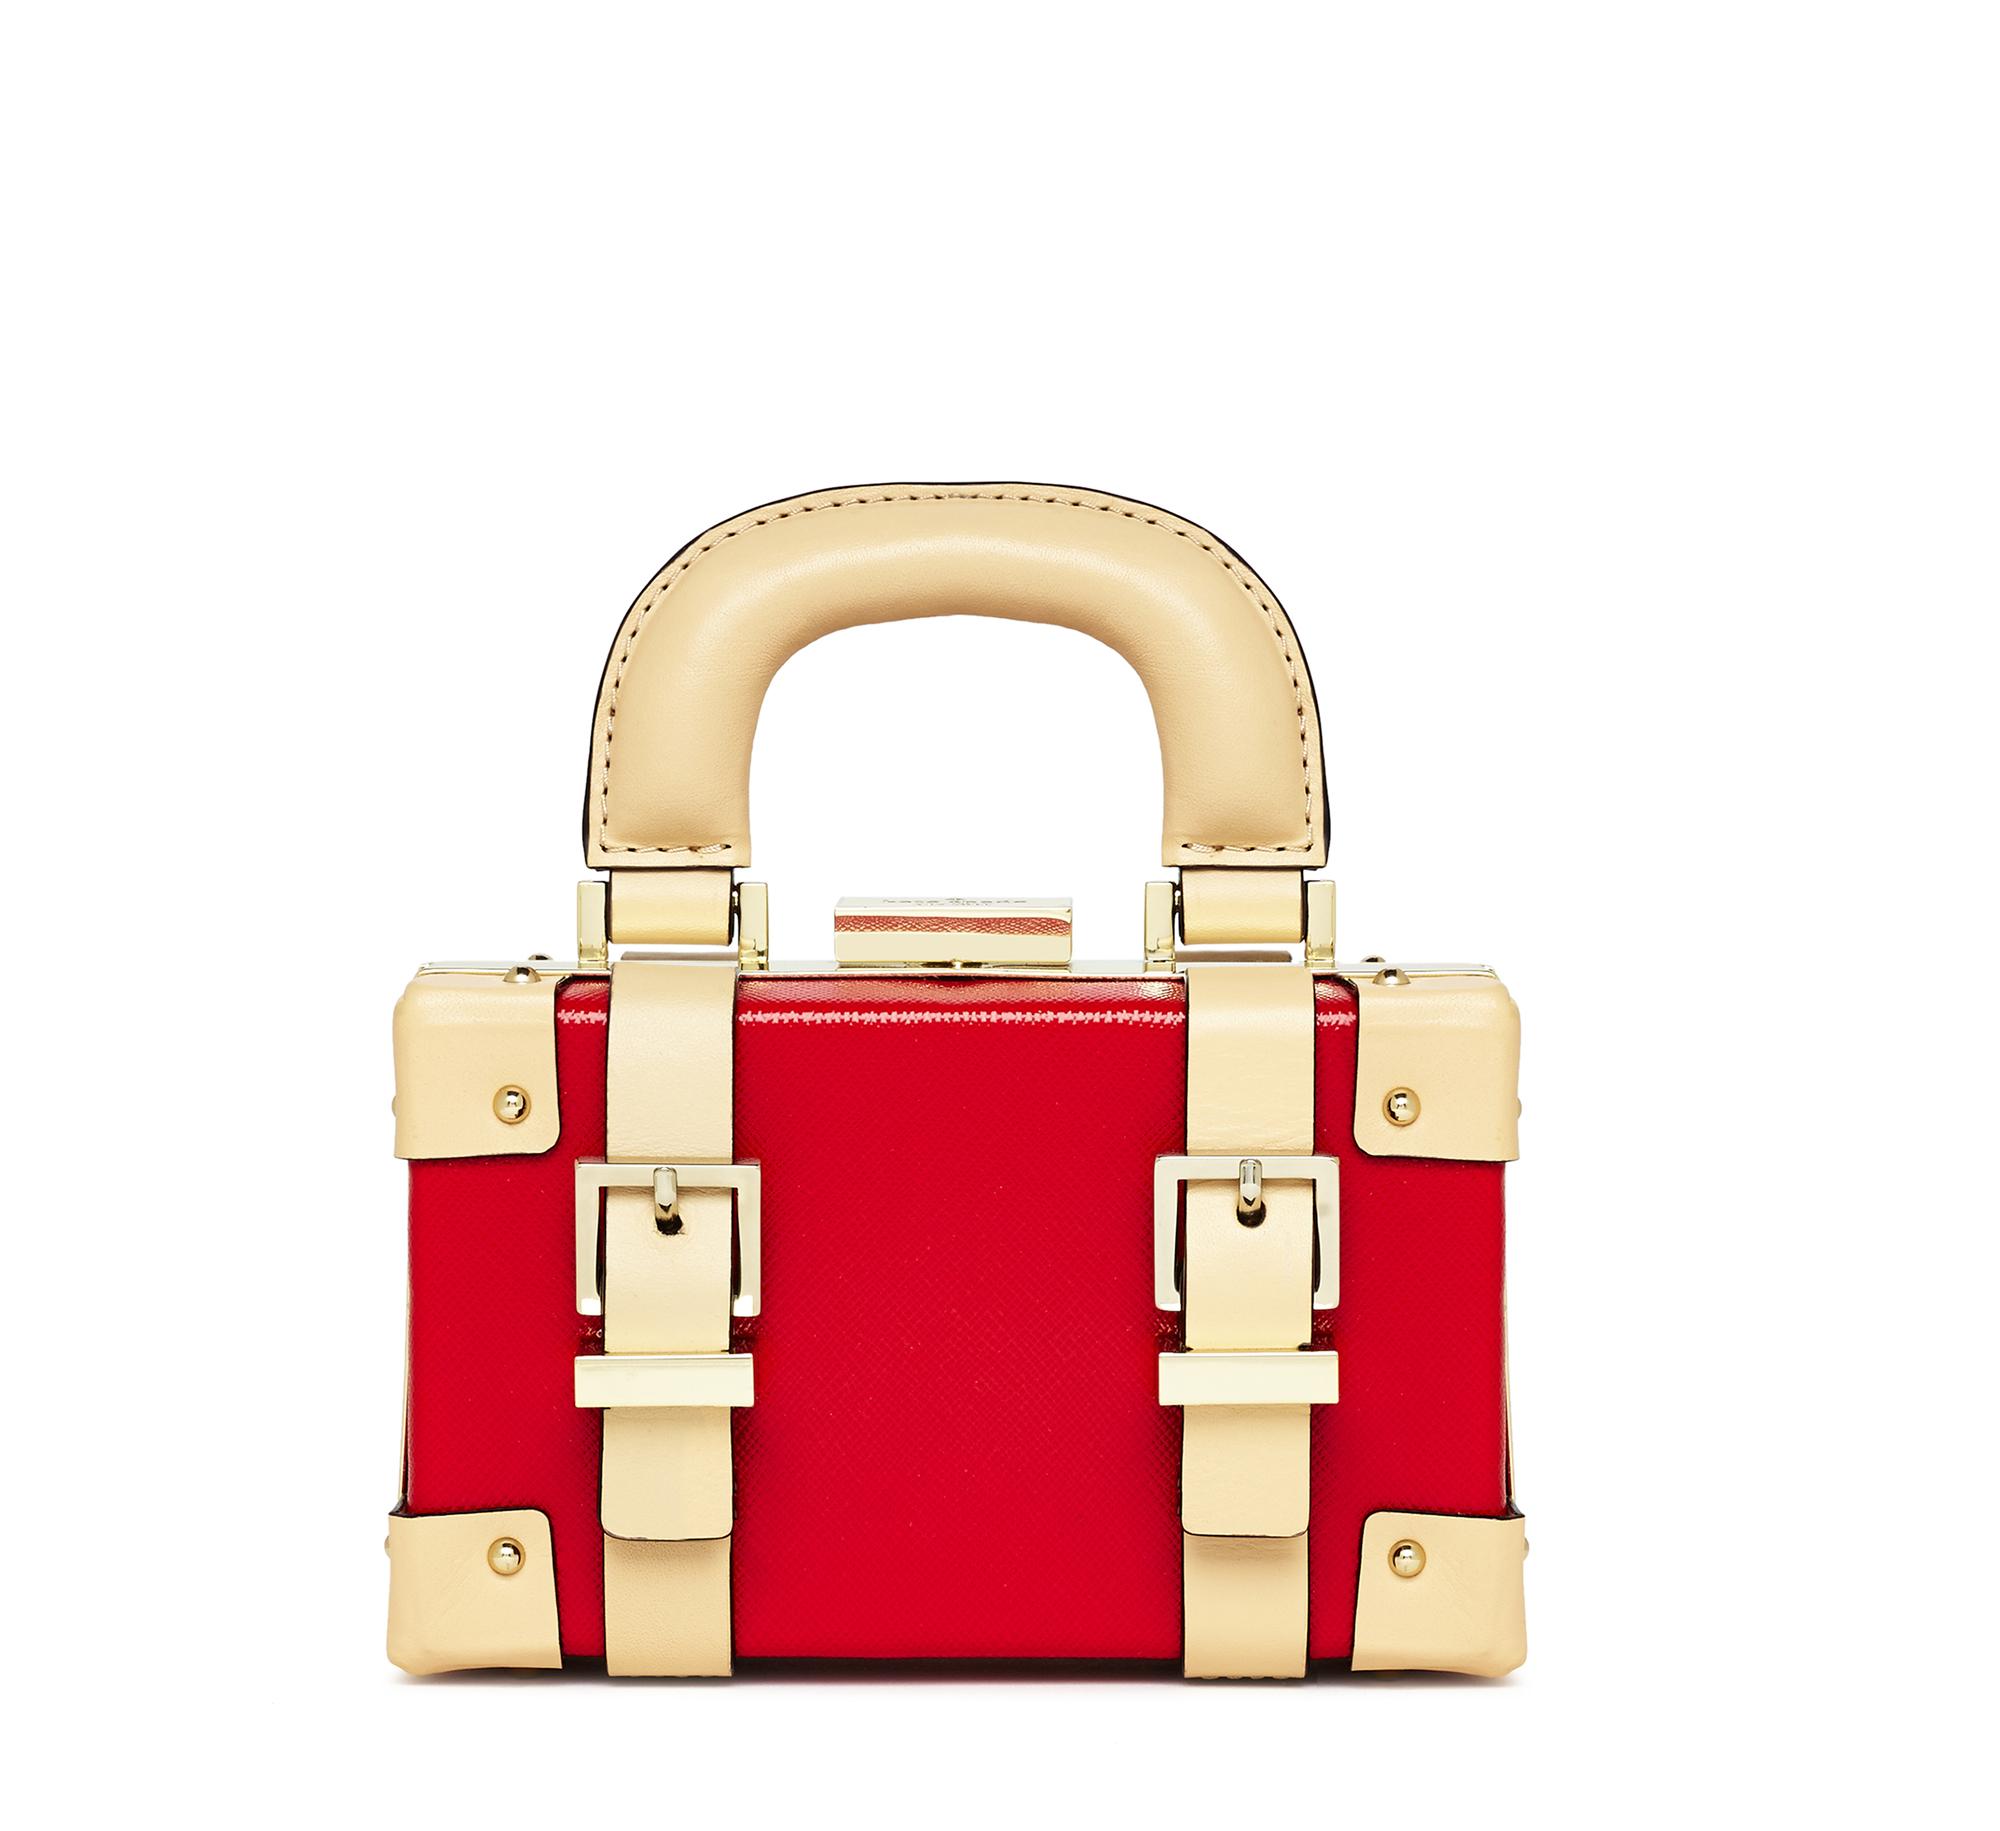 mini luggage crossbody TW$13,800